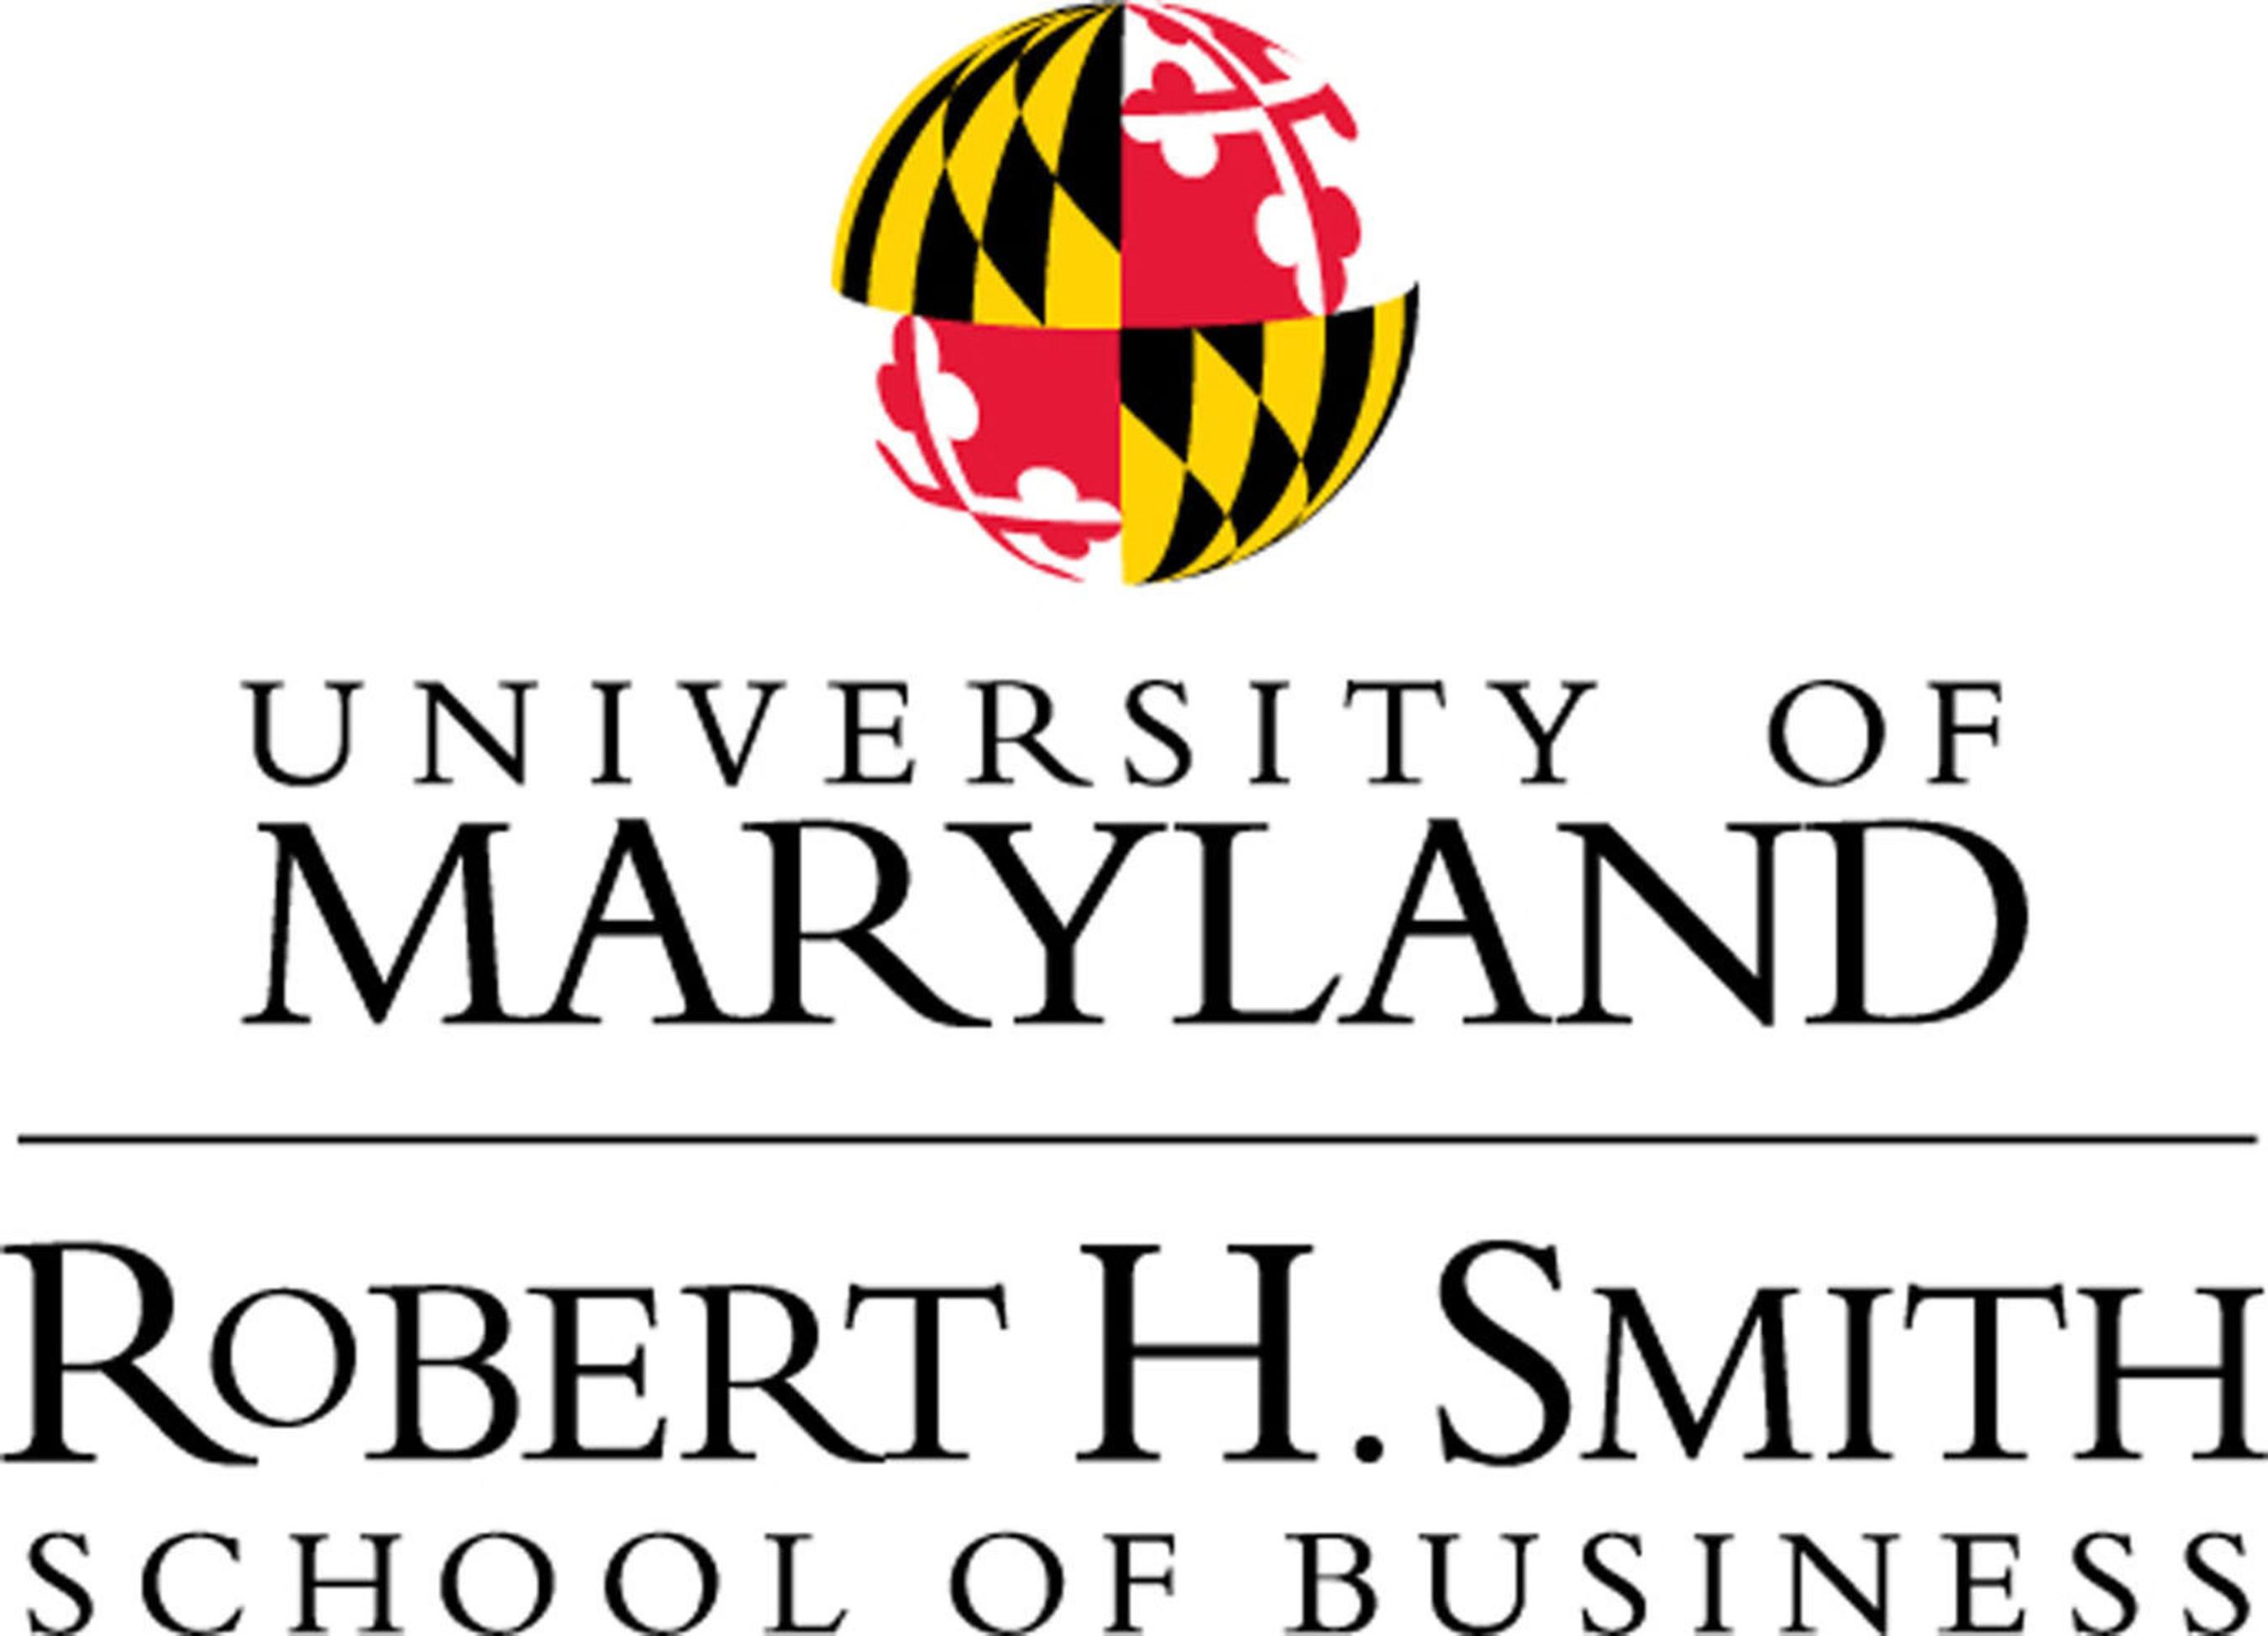 Logo. (PRNewsFoto/University of Maryland Robert H. Smith School of Business)